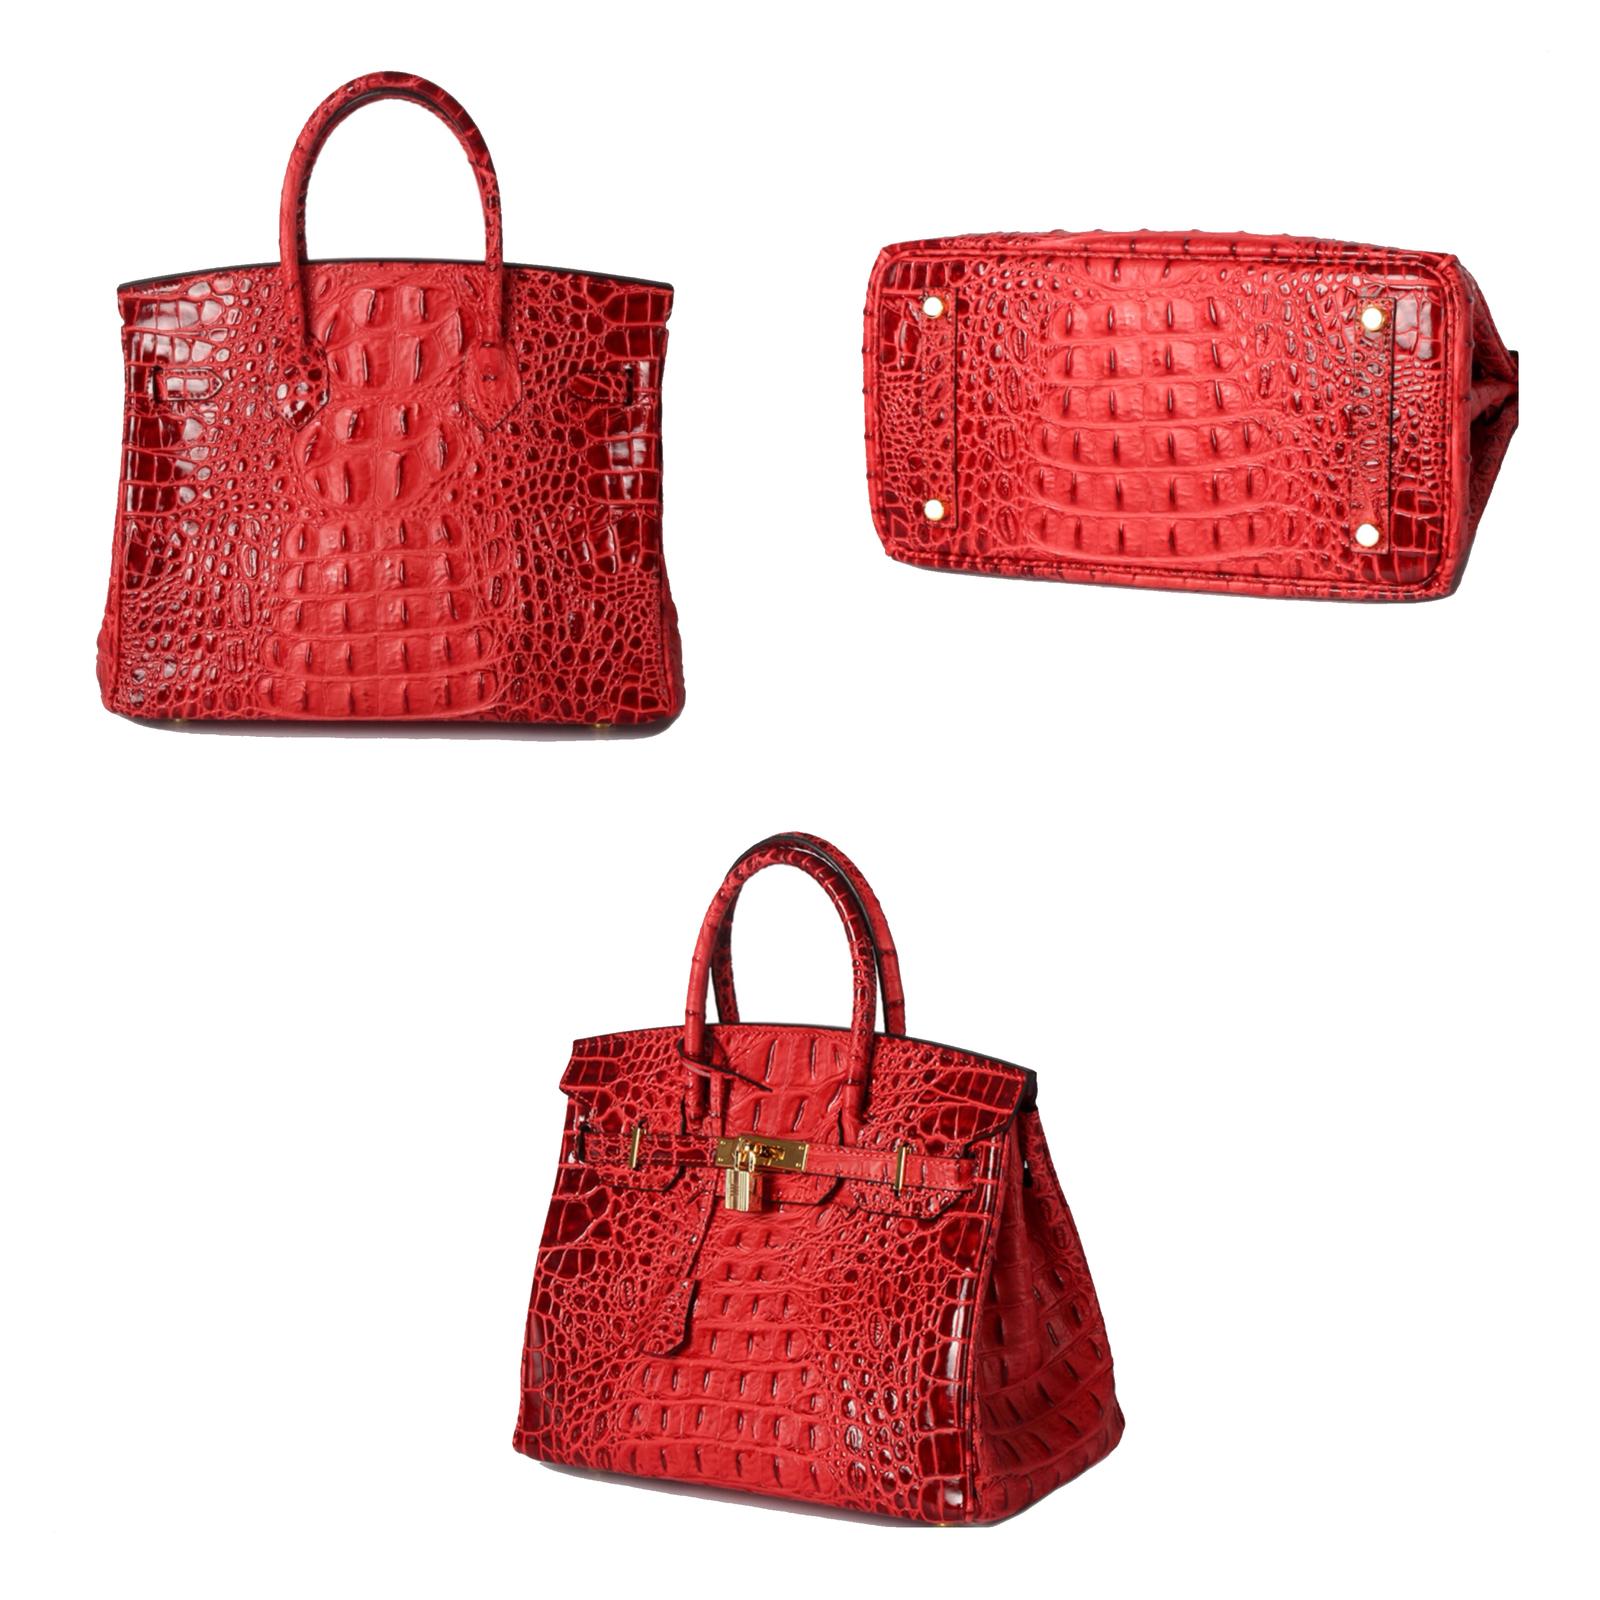 35 cm Crocodile Embossed Italian Leather Lock and Key Satchel Celebrity Handbag